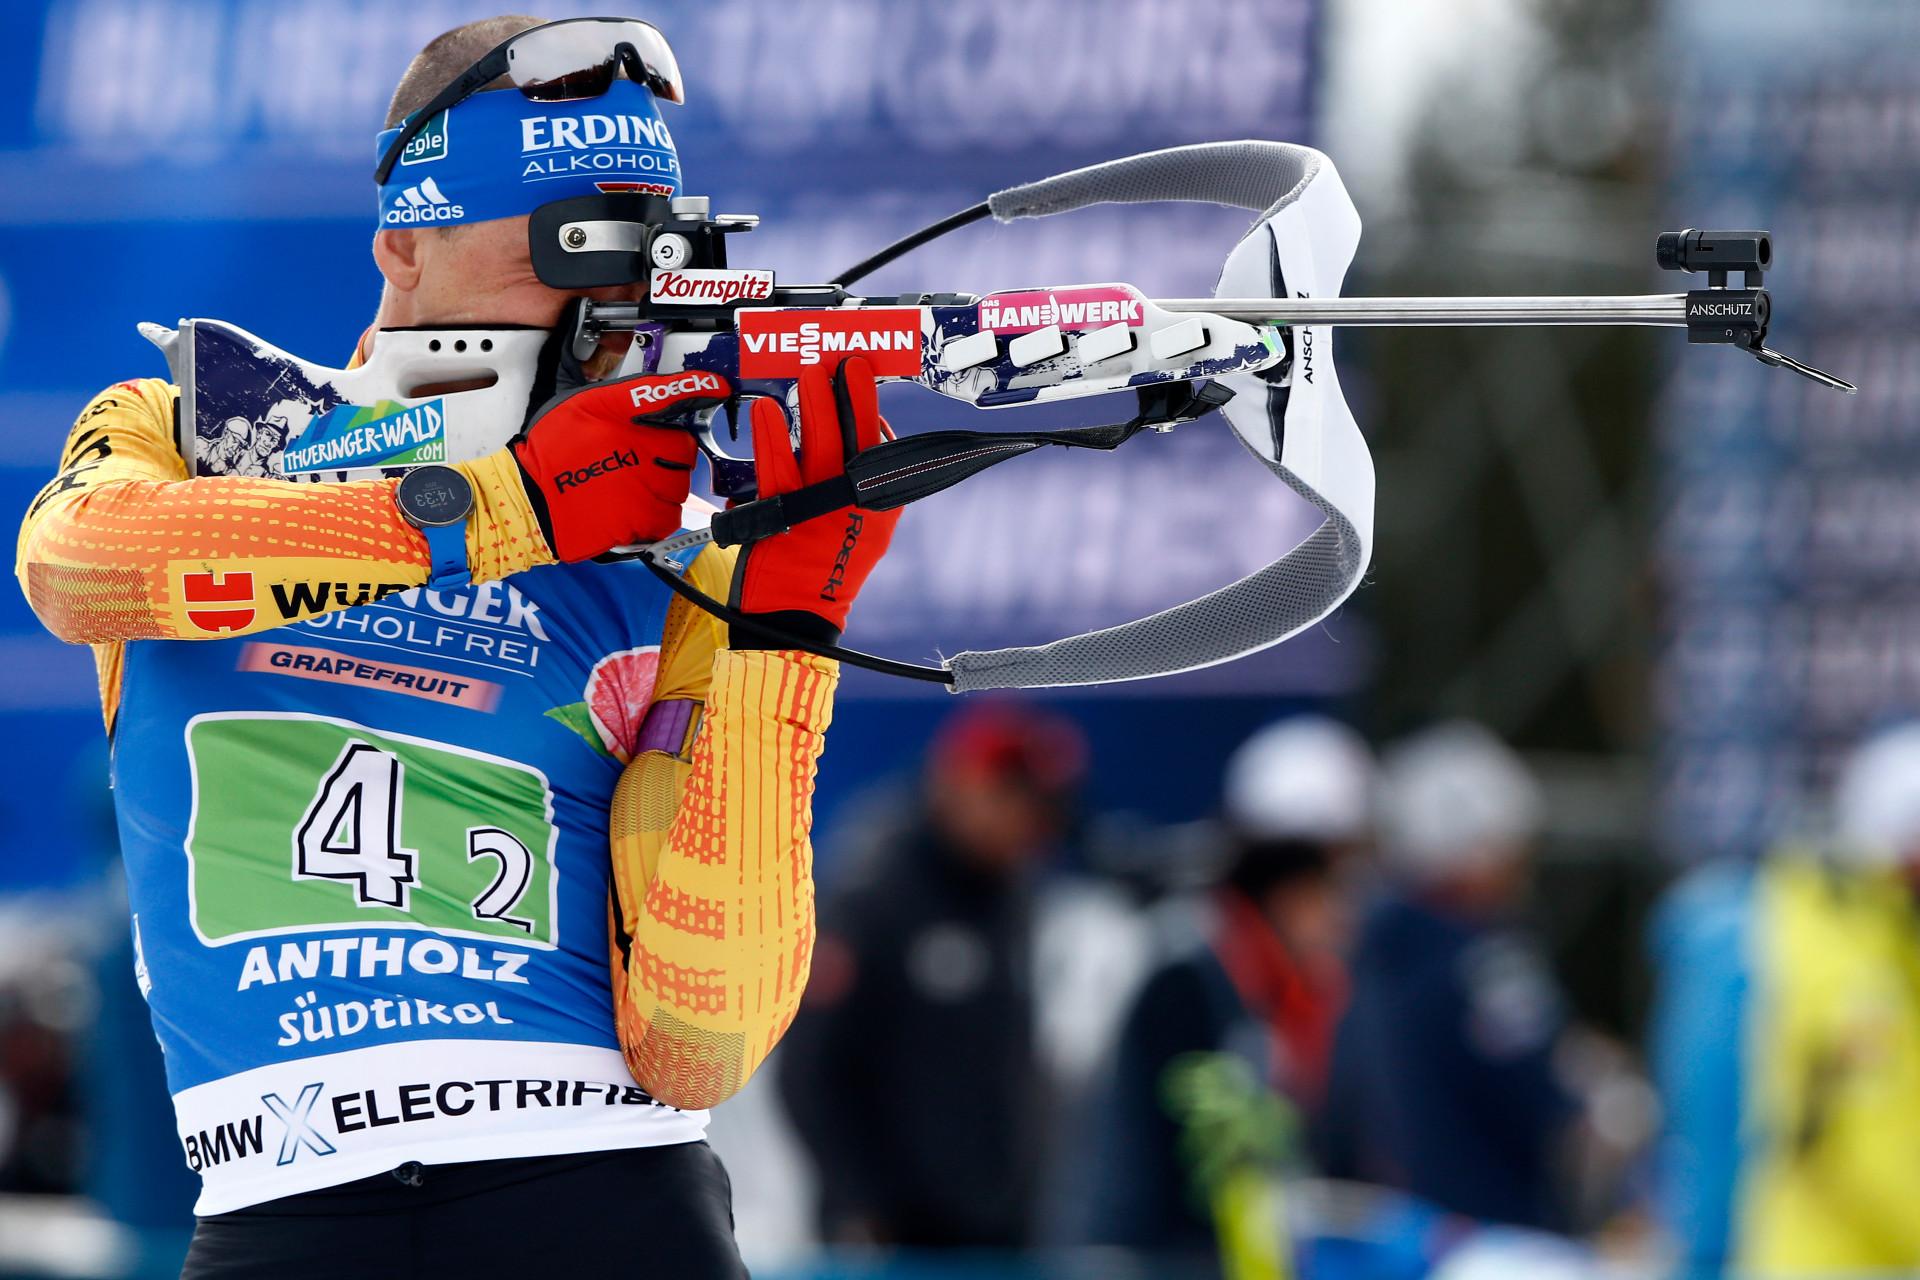 Erik Lesser_Germany_Biathlon_Antholz_20022020_Getty Images_Christophe Pallot_Agence Zoom